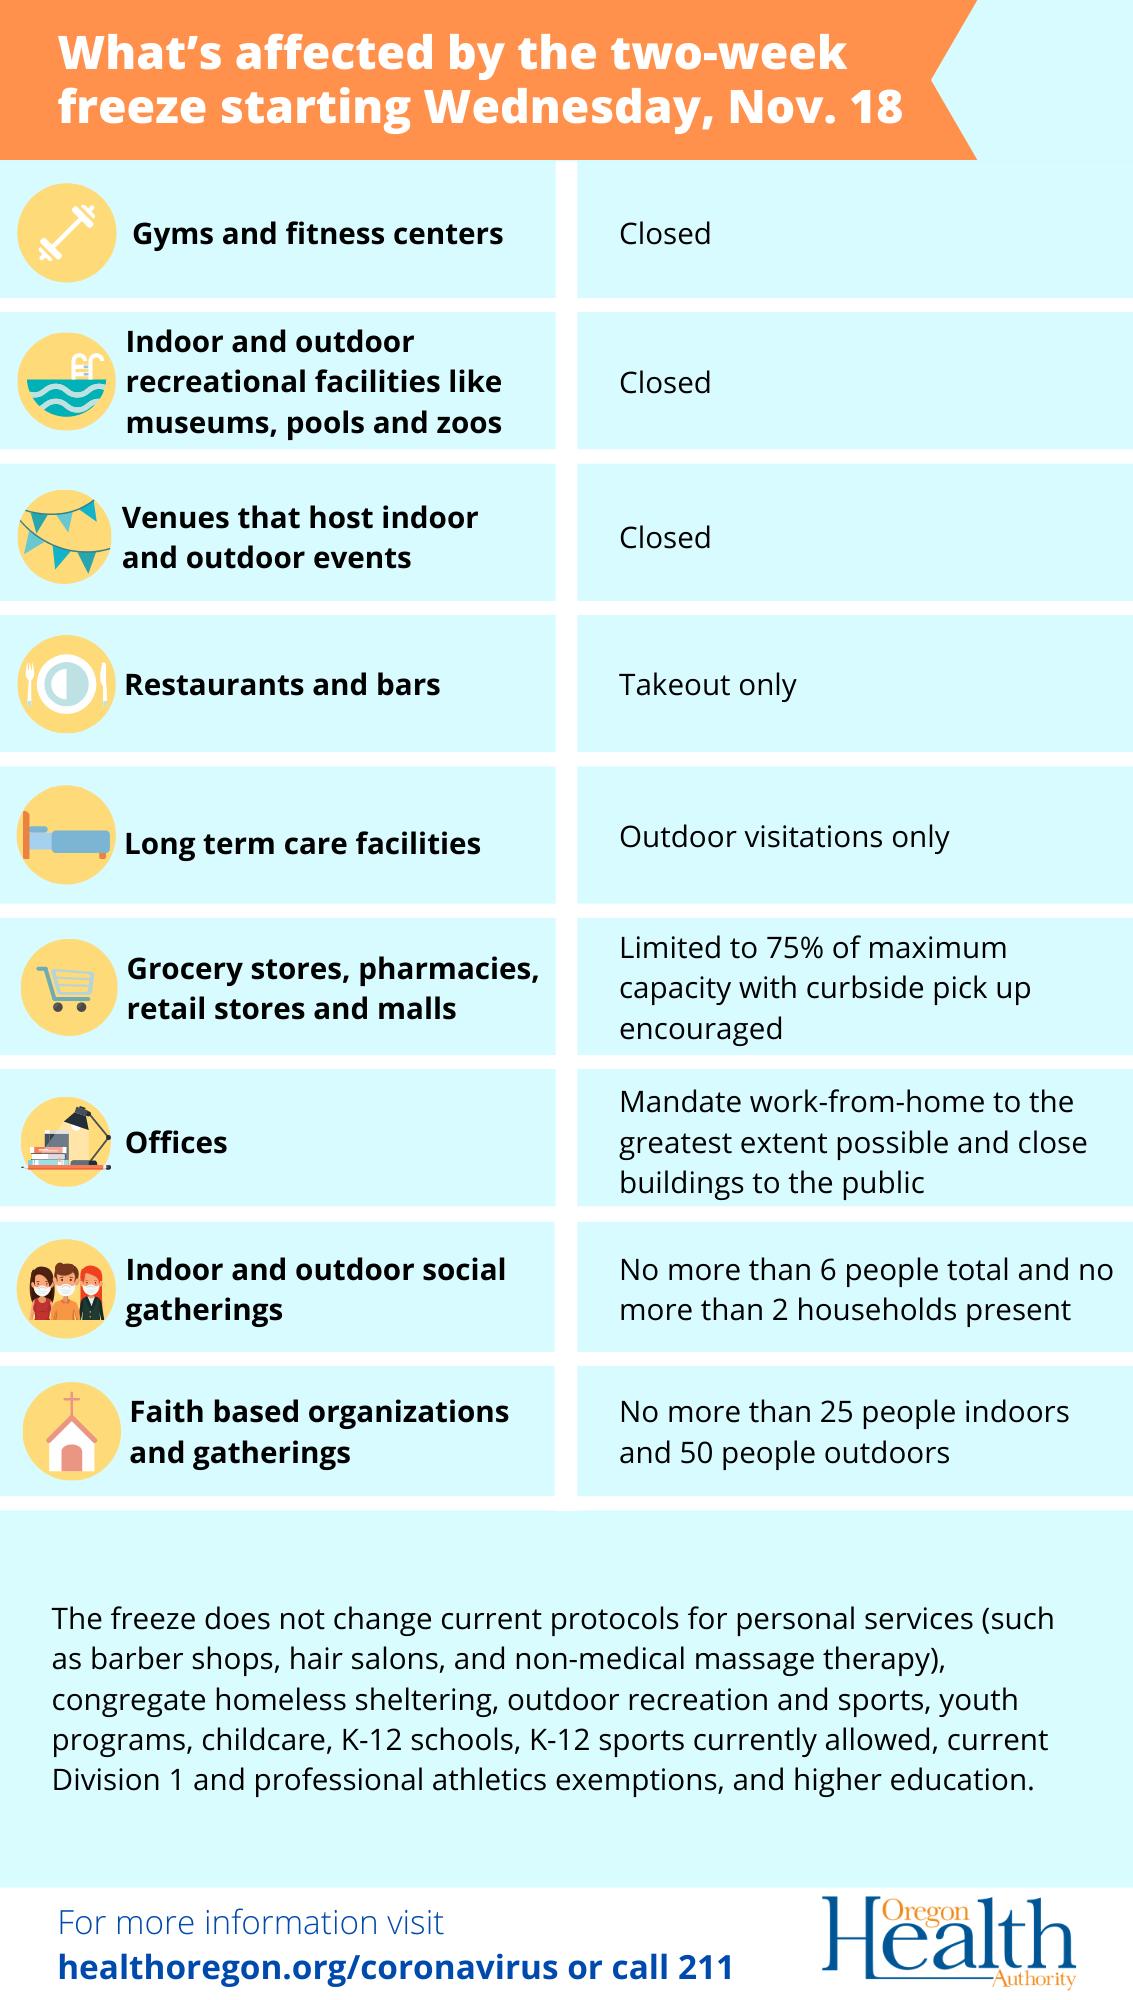 Two-week Freeze Restrictions List